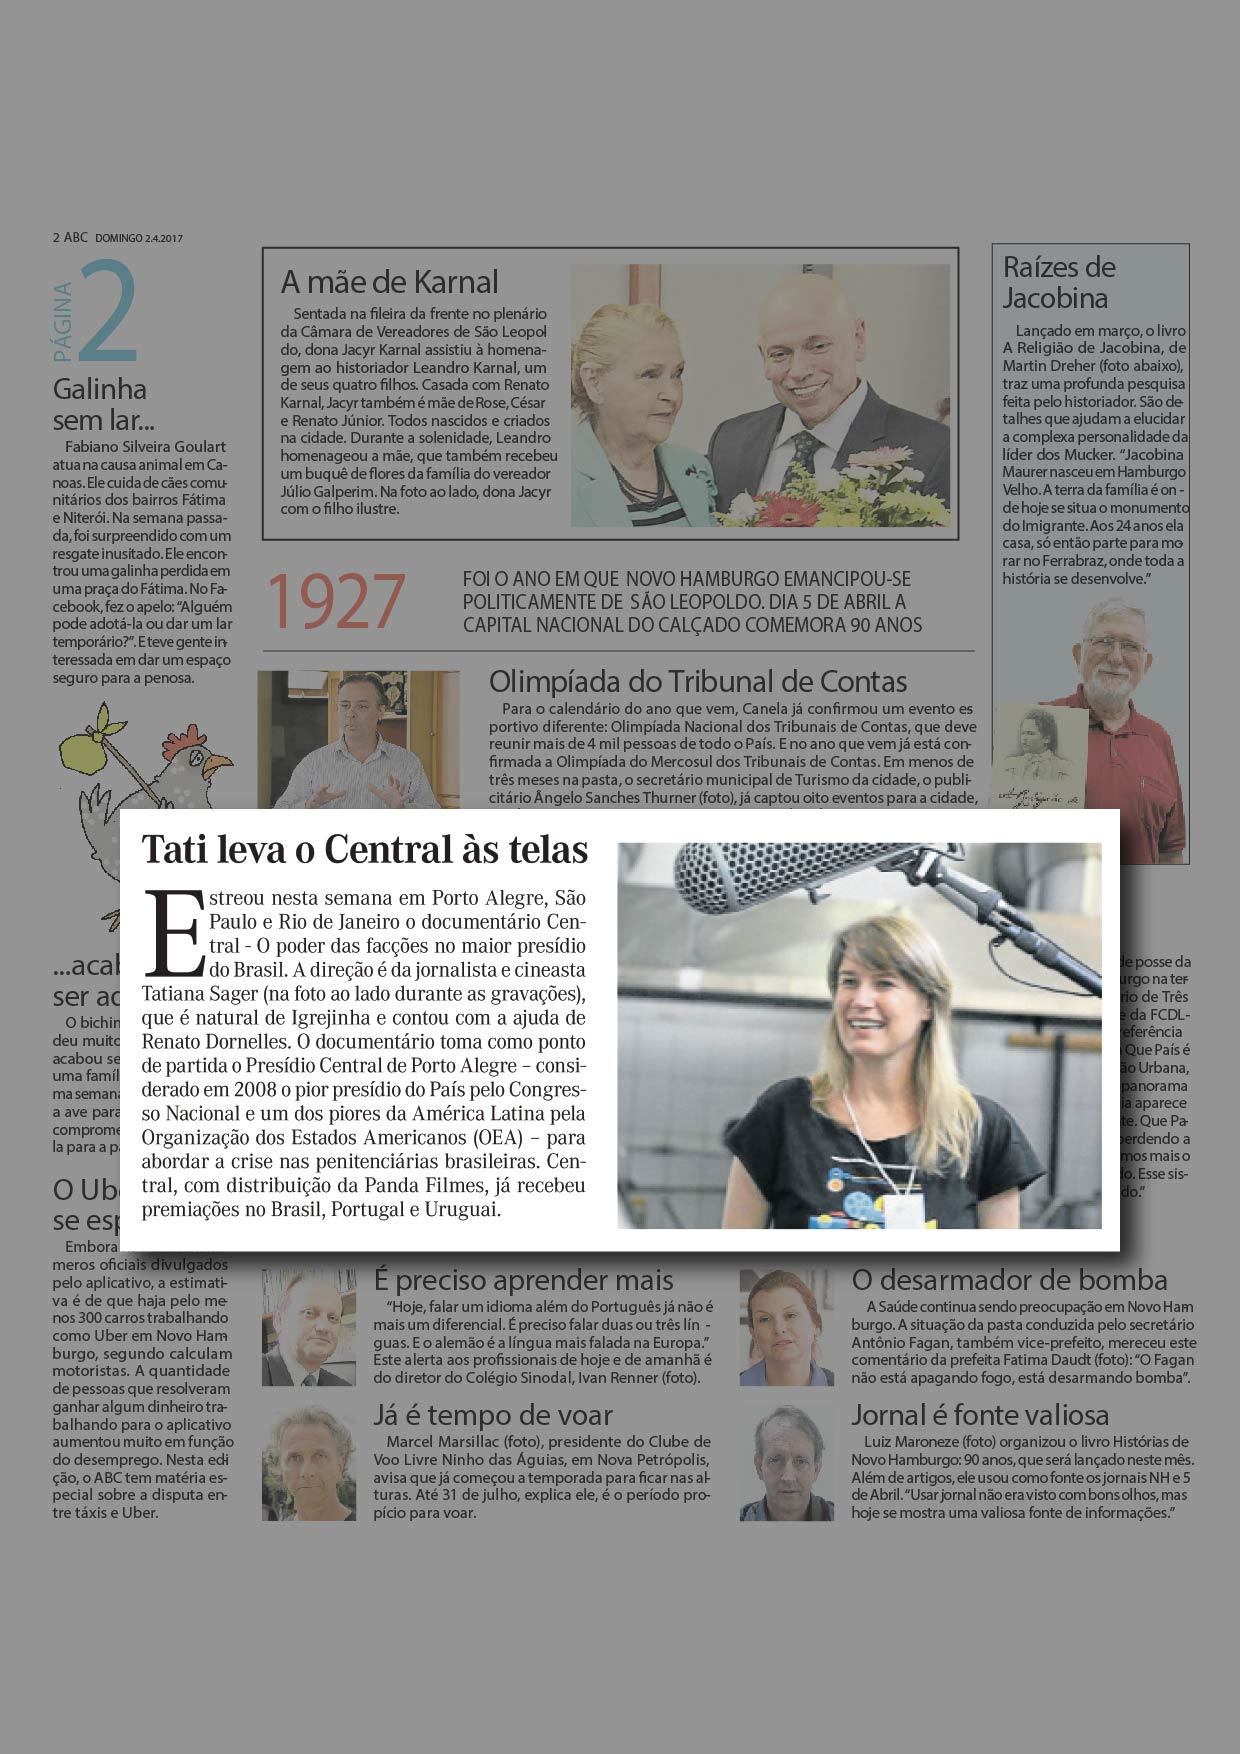 ABC Domingo Jornal NH | 24.04